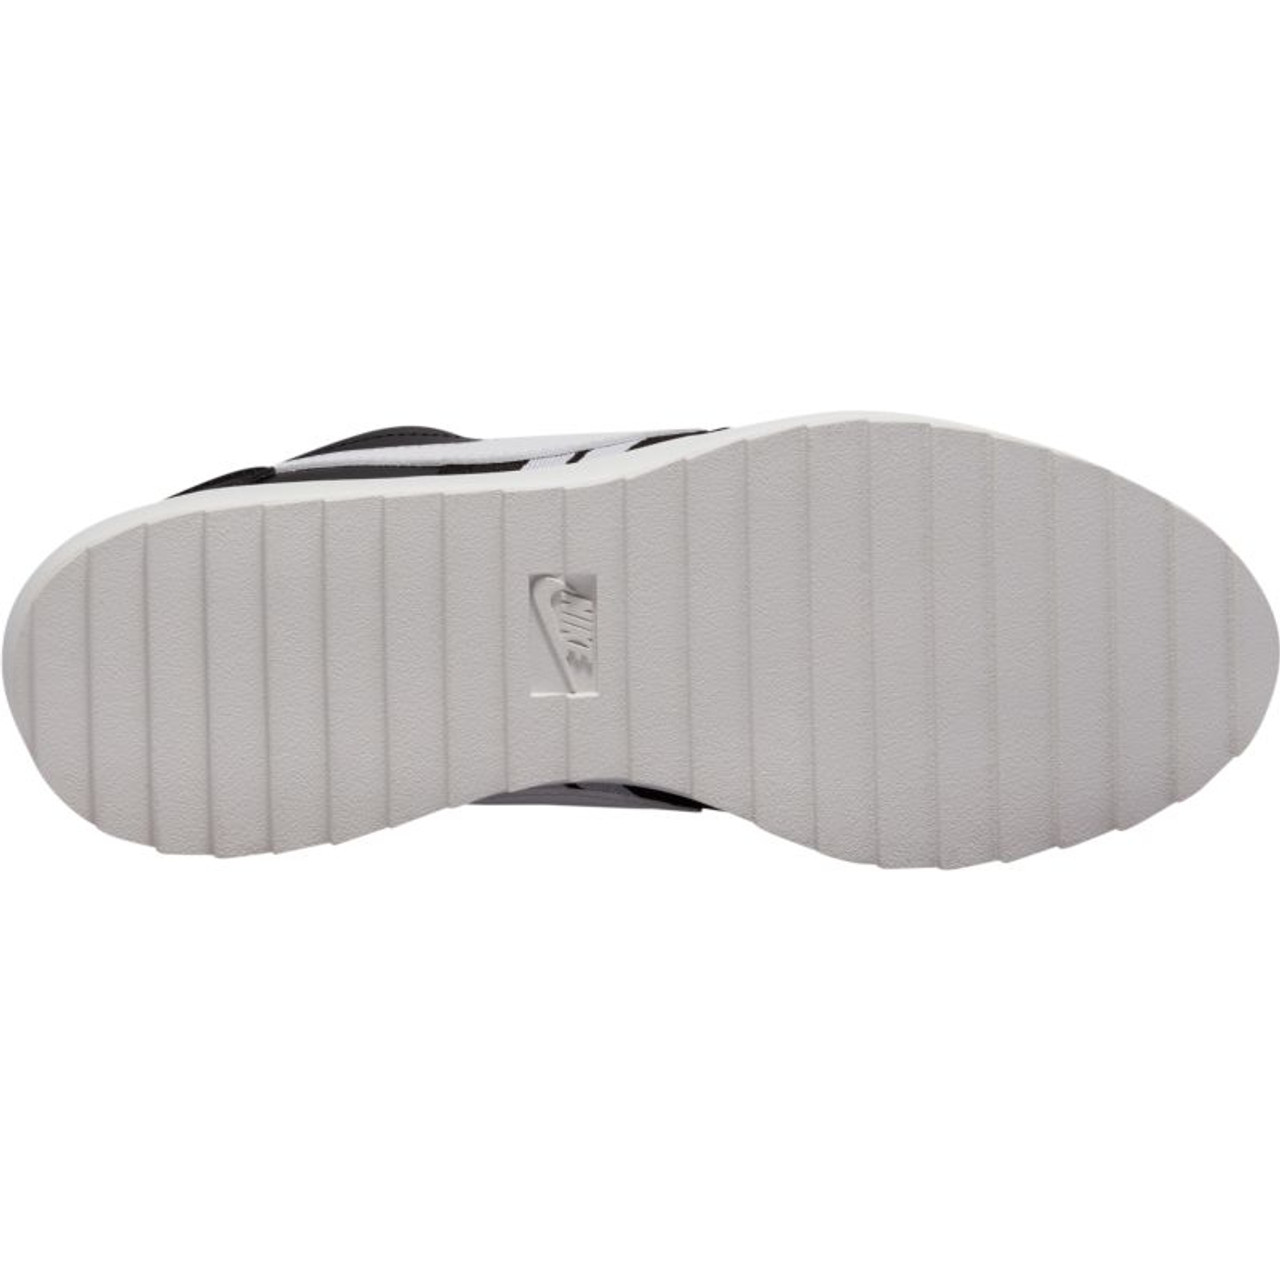 Nike Womens Cortez G Golf Shoes - Black / White / Metallic Gold